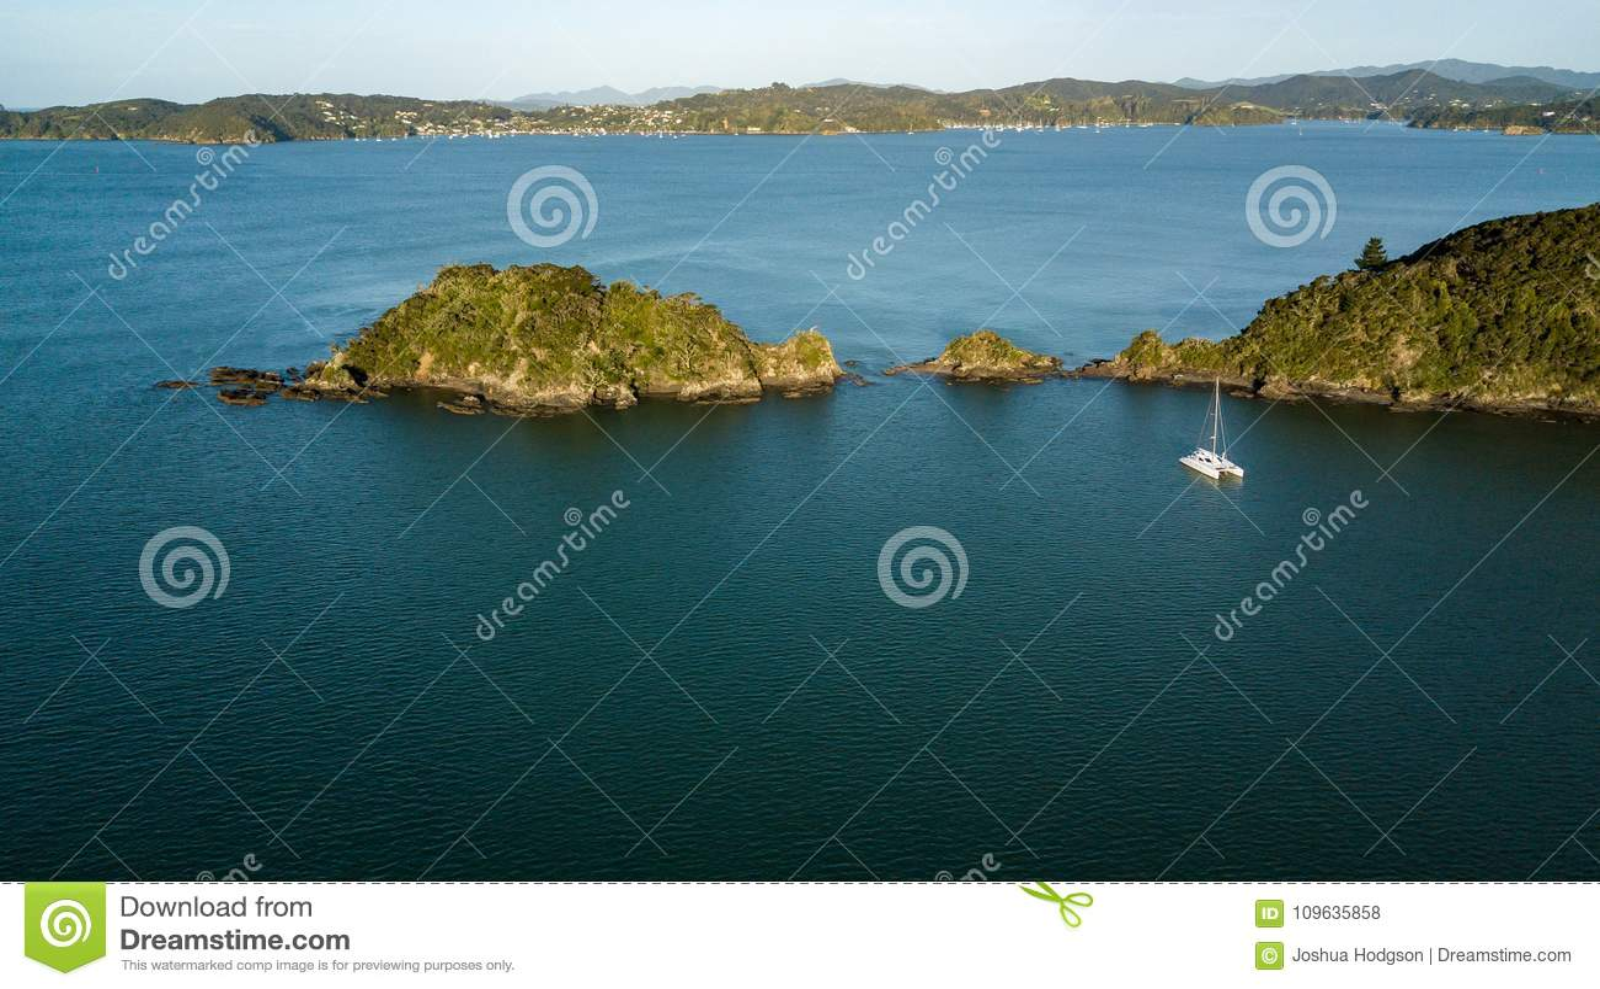 Boat In New Zealand Bay Of Islands, Paihia Stock Photo